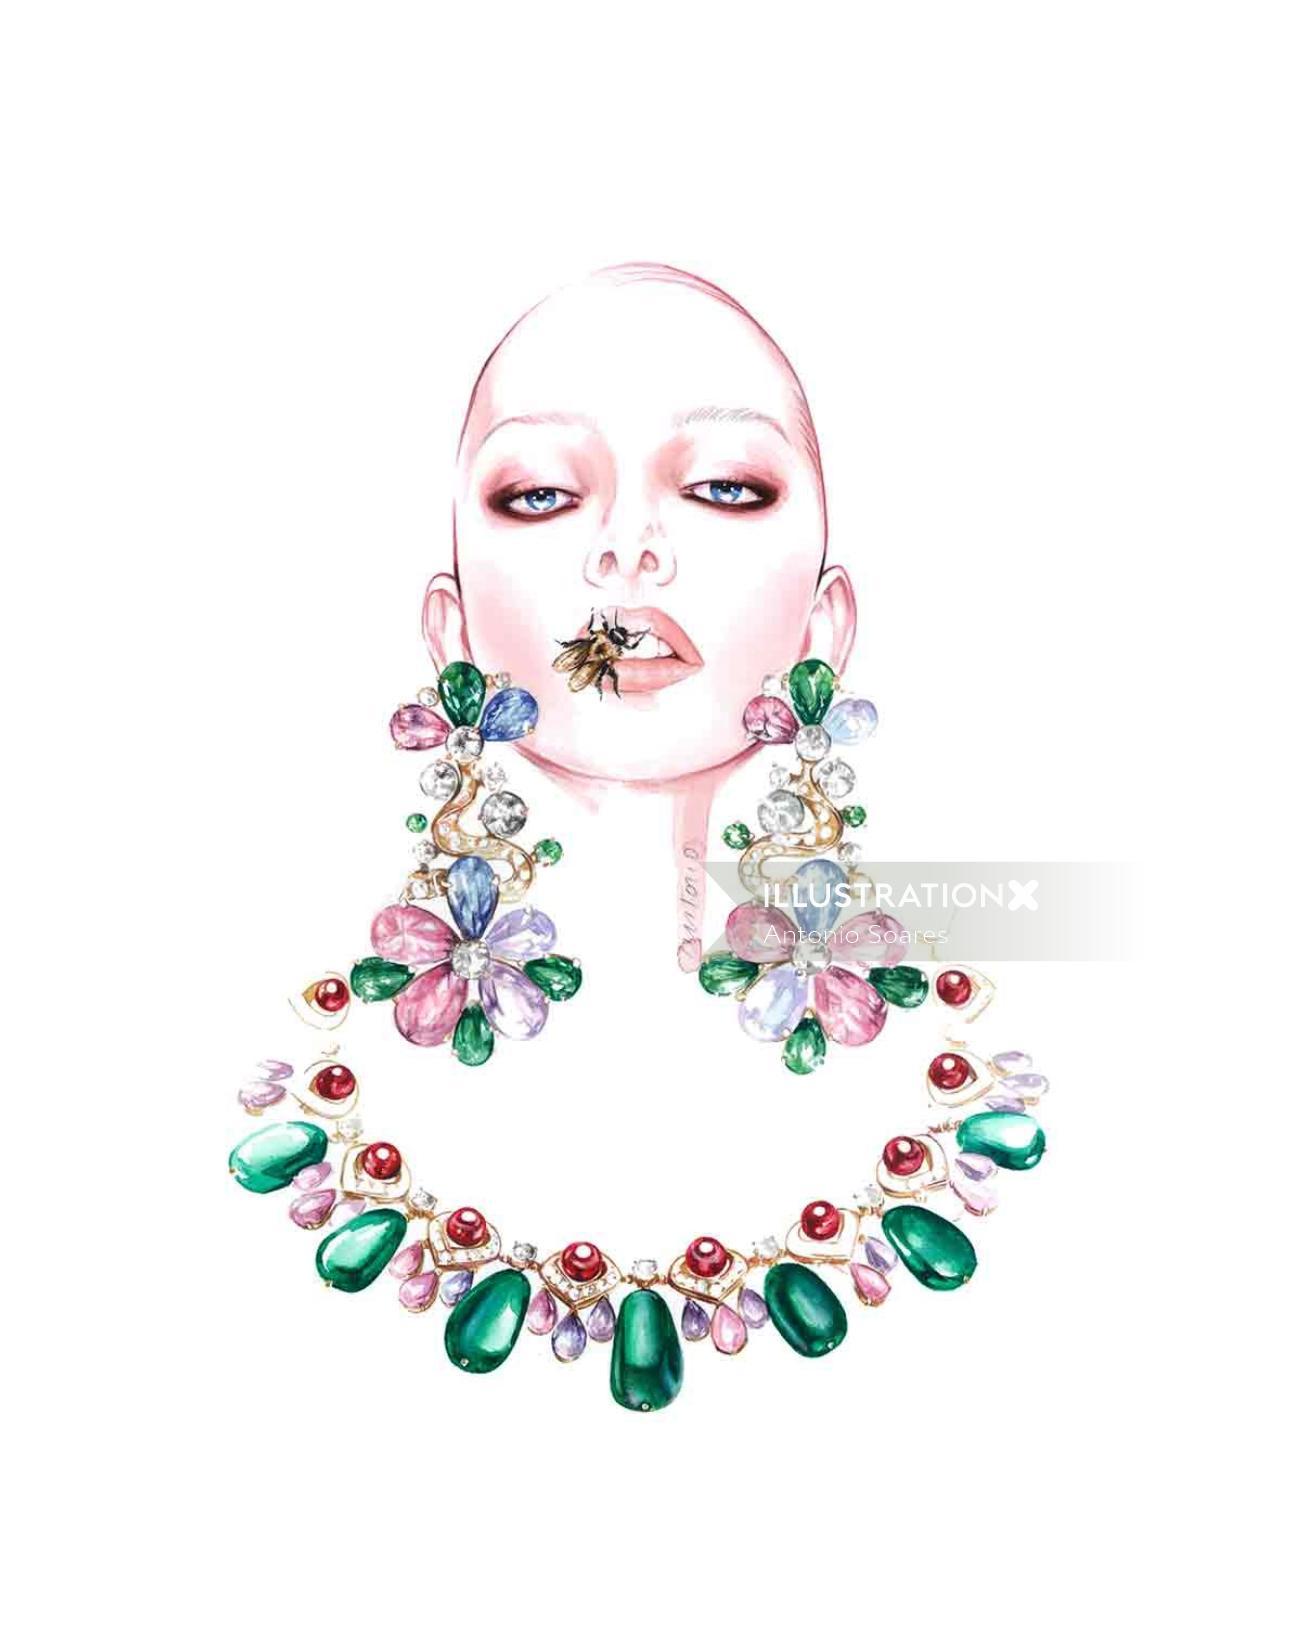 Jewellery Illustration For BVLGARI